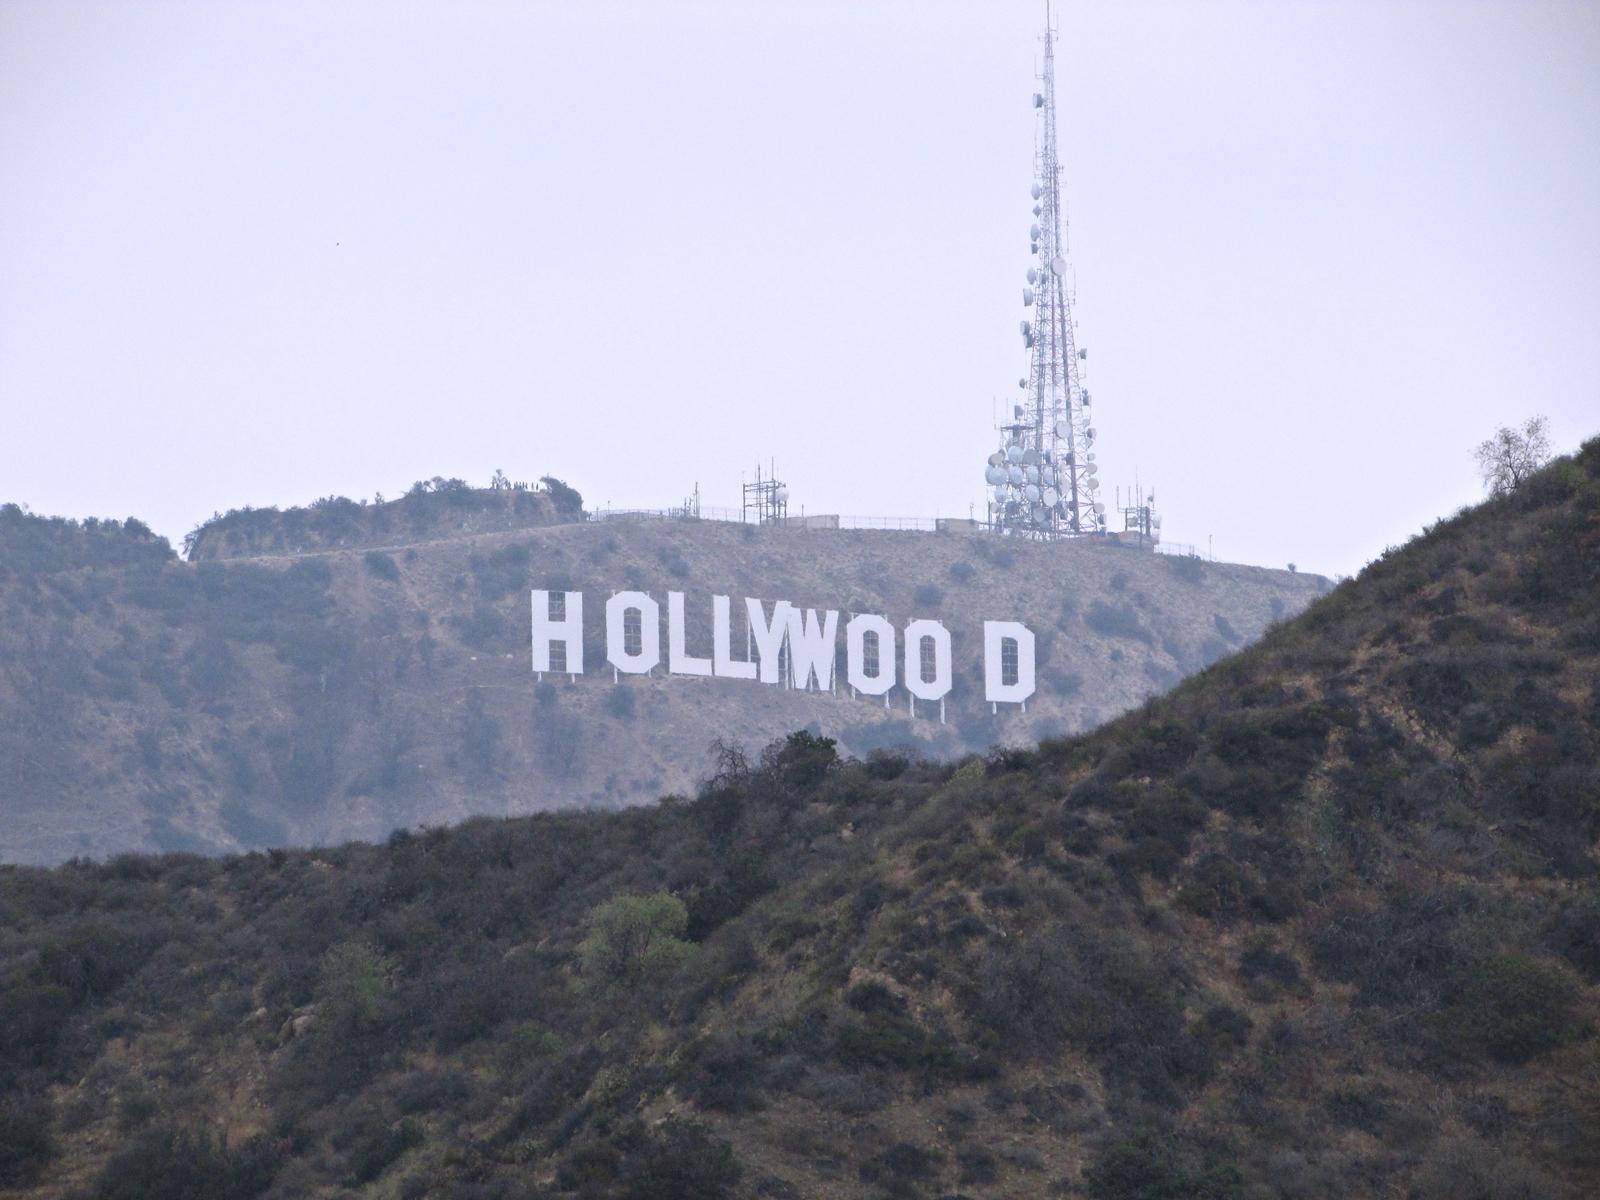 Hollywood Sign - USA Roadtrip - Amerika Rundreise - Fashionladyloves by Tamara Wagner - Travelblog